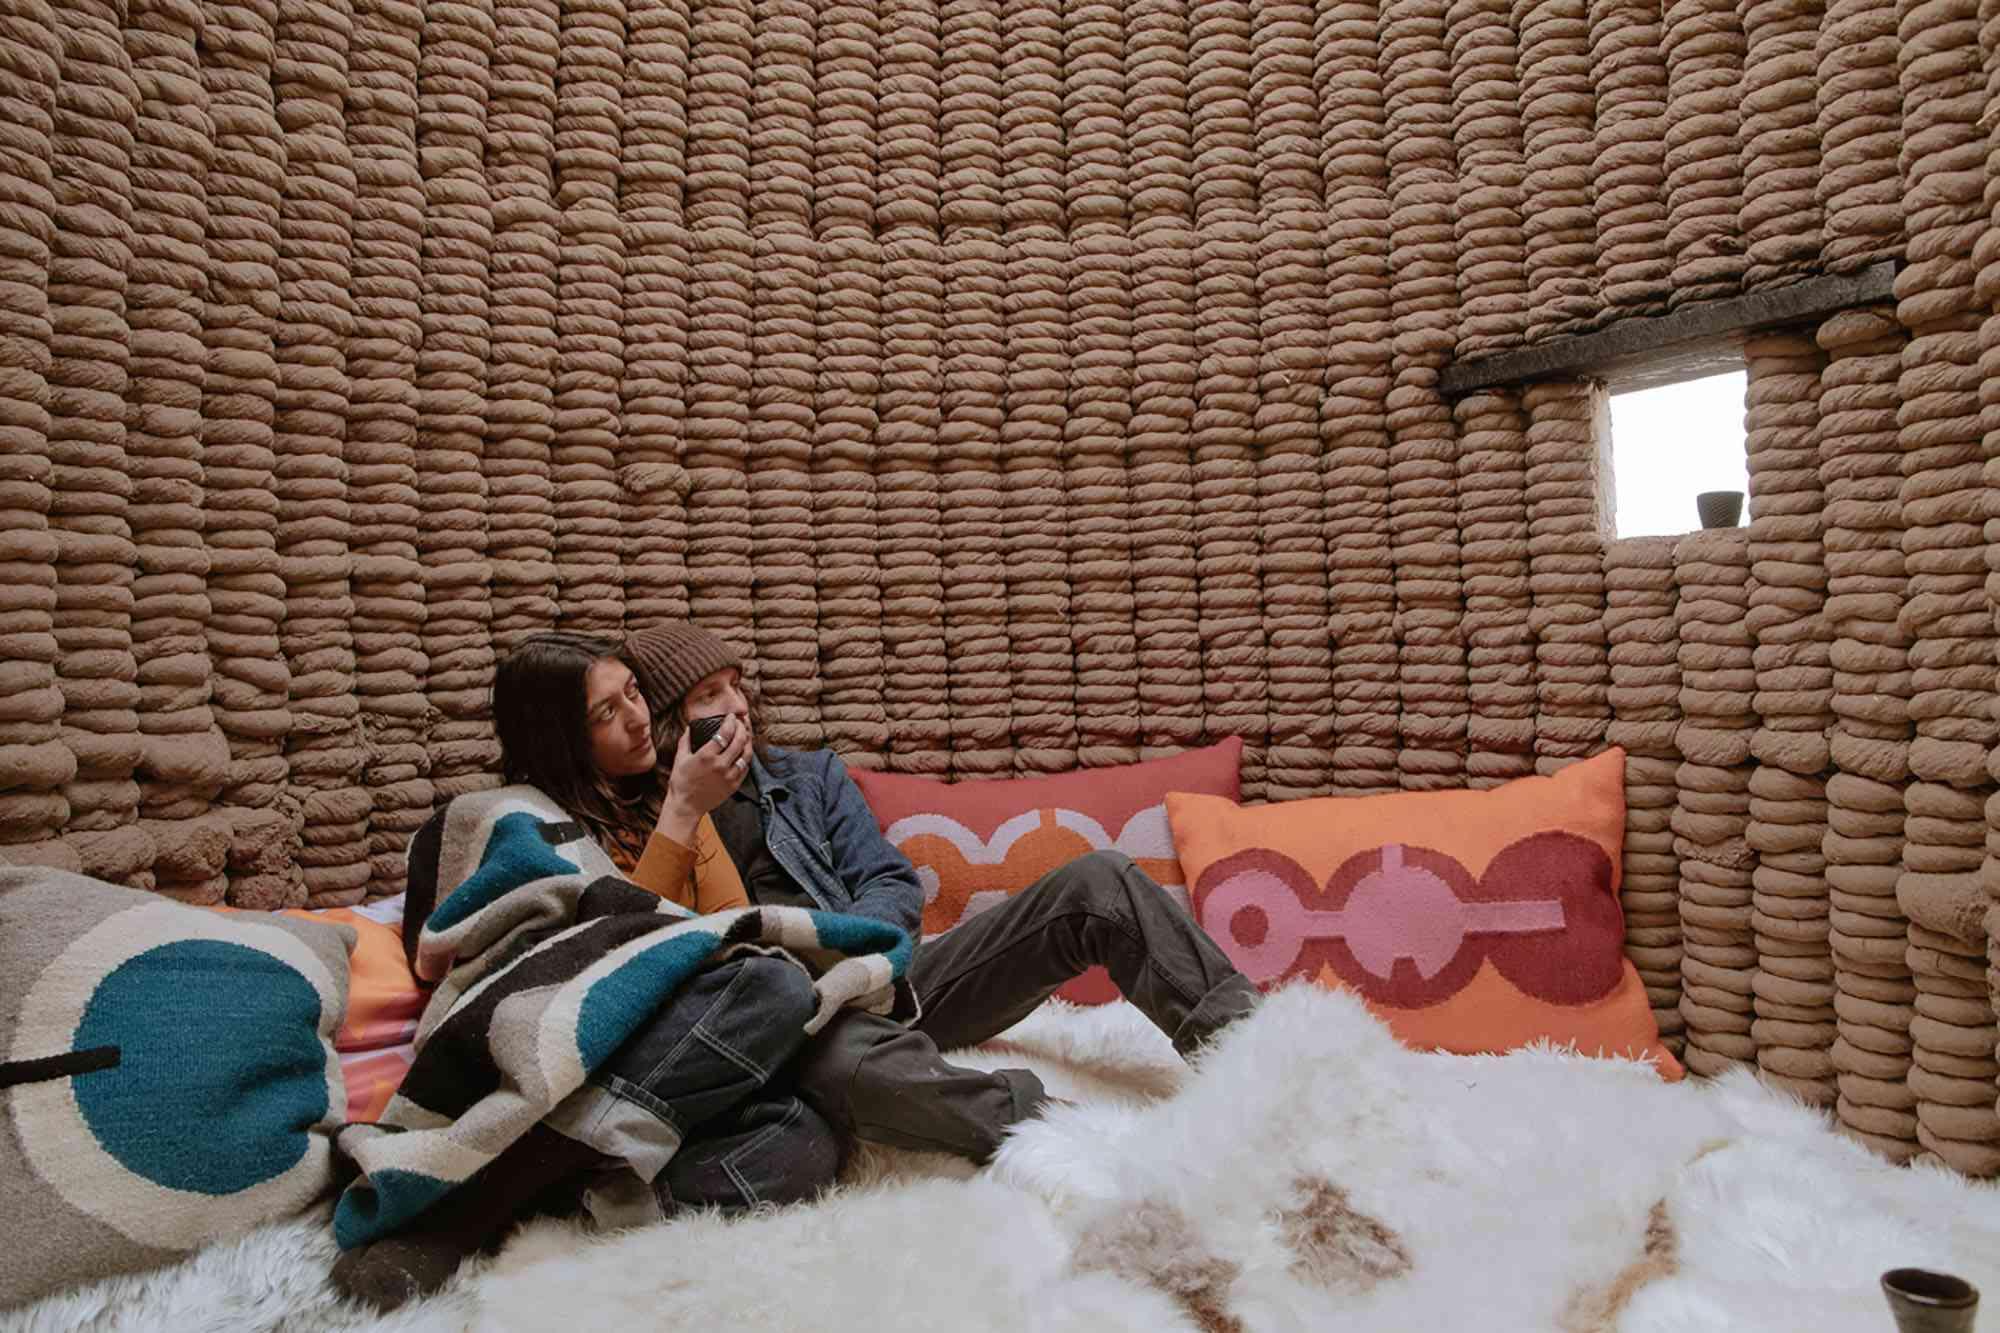 Casa Covida 3D printed adobe house by Emerging Objects sleeping room